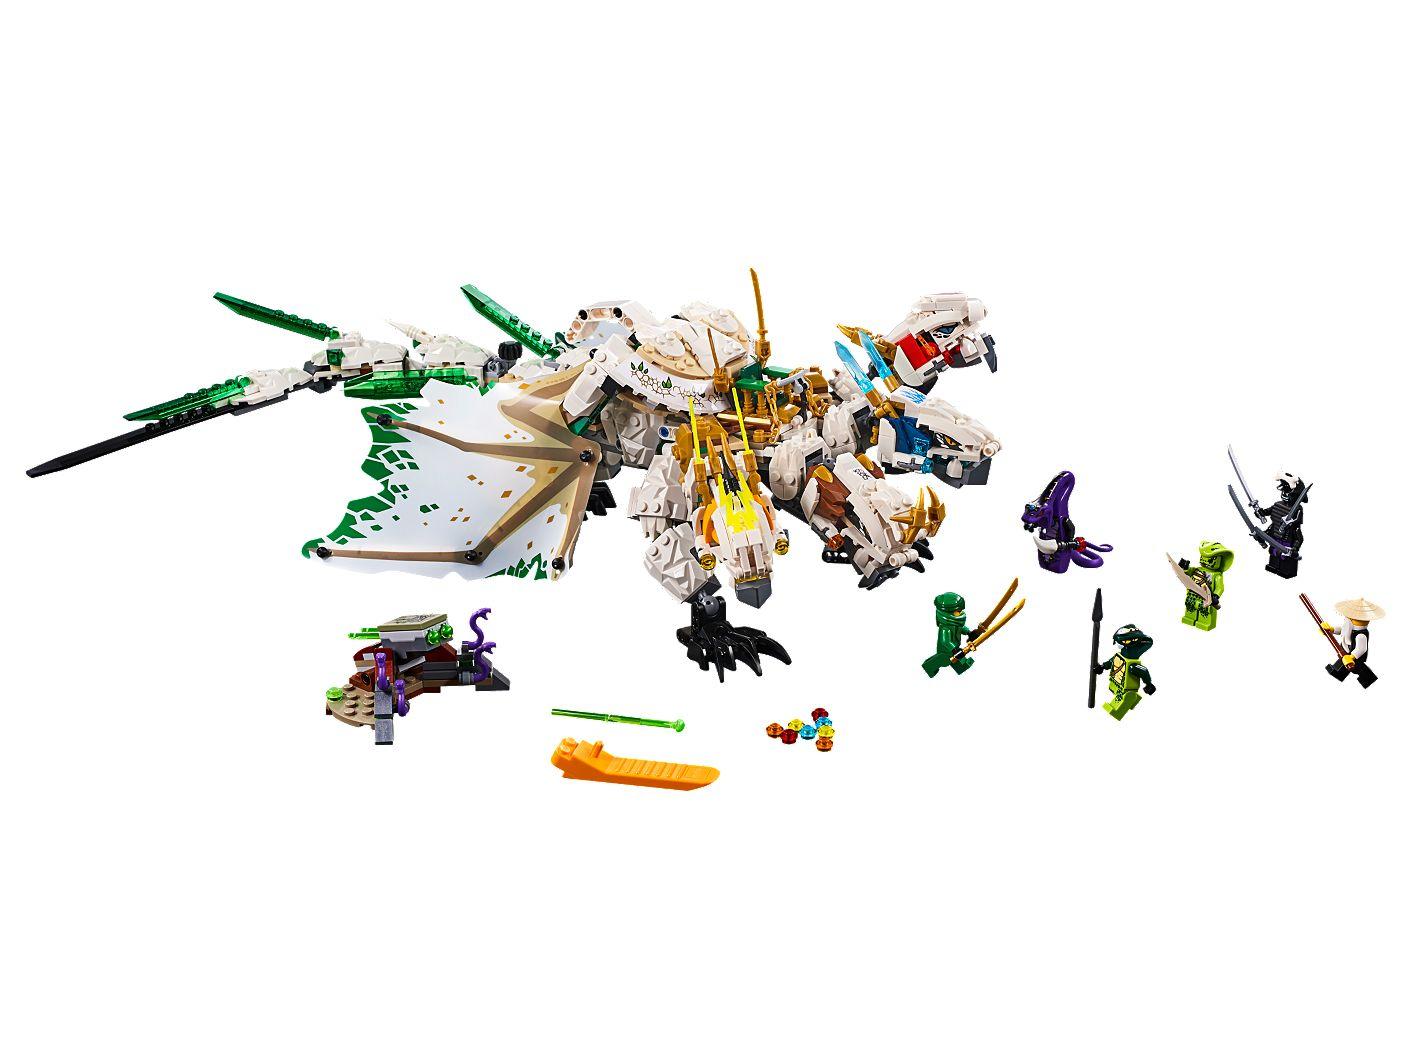 Lego Ninjago Dragon The Ultra Drago...